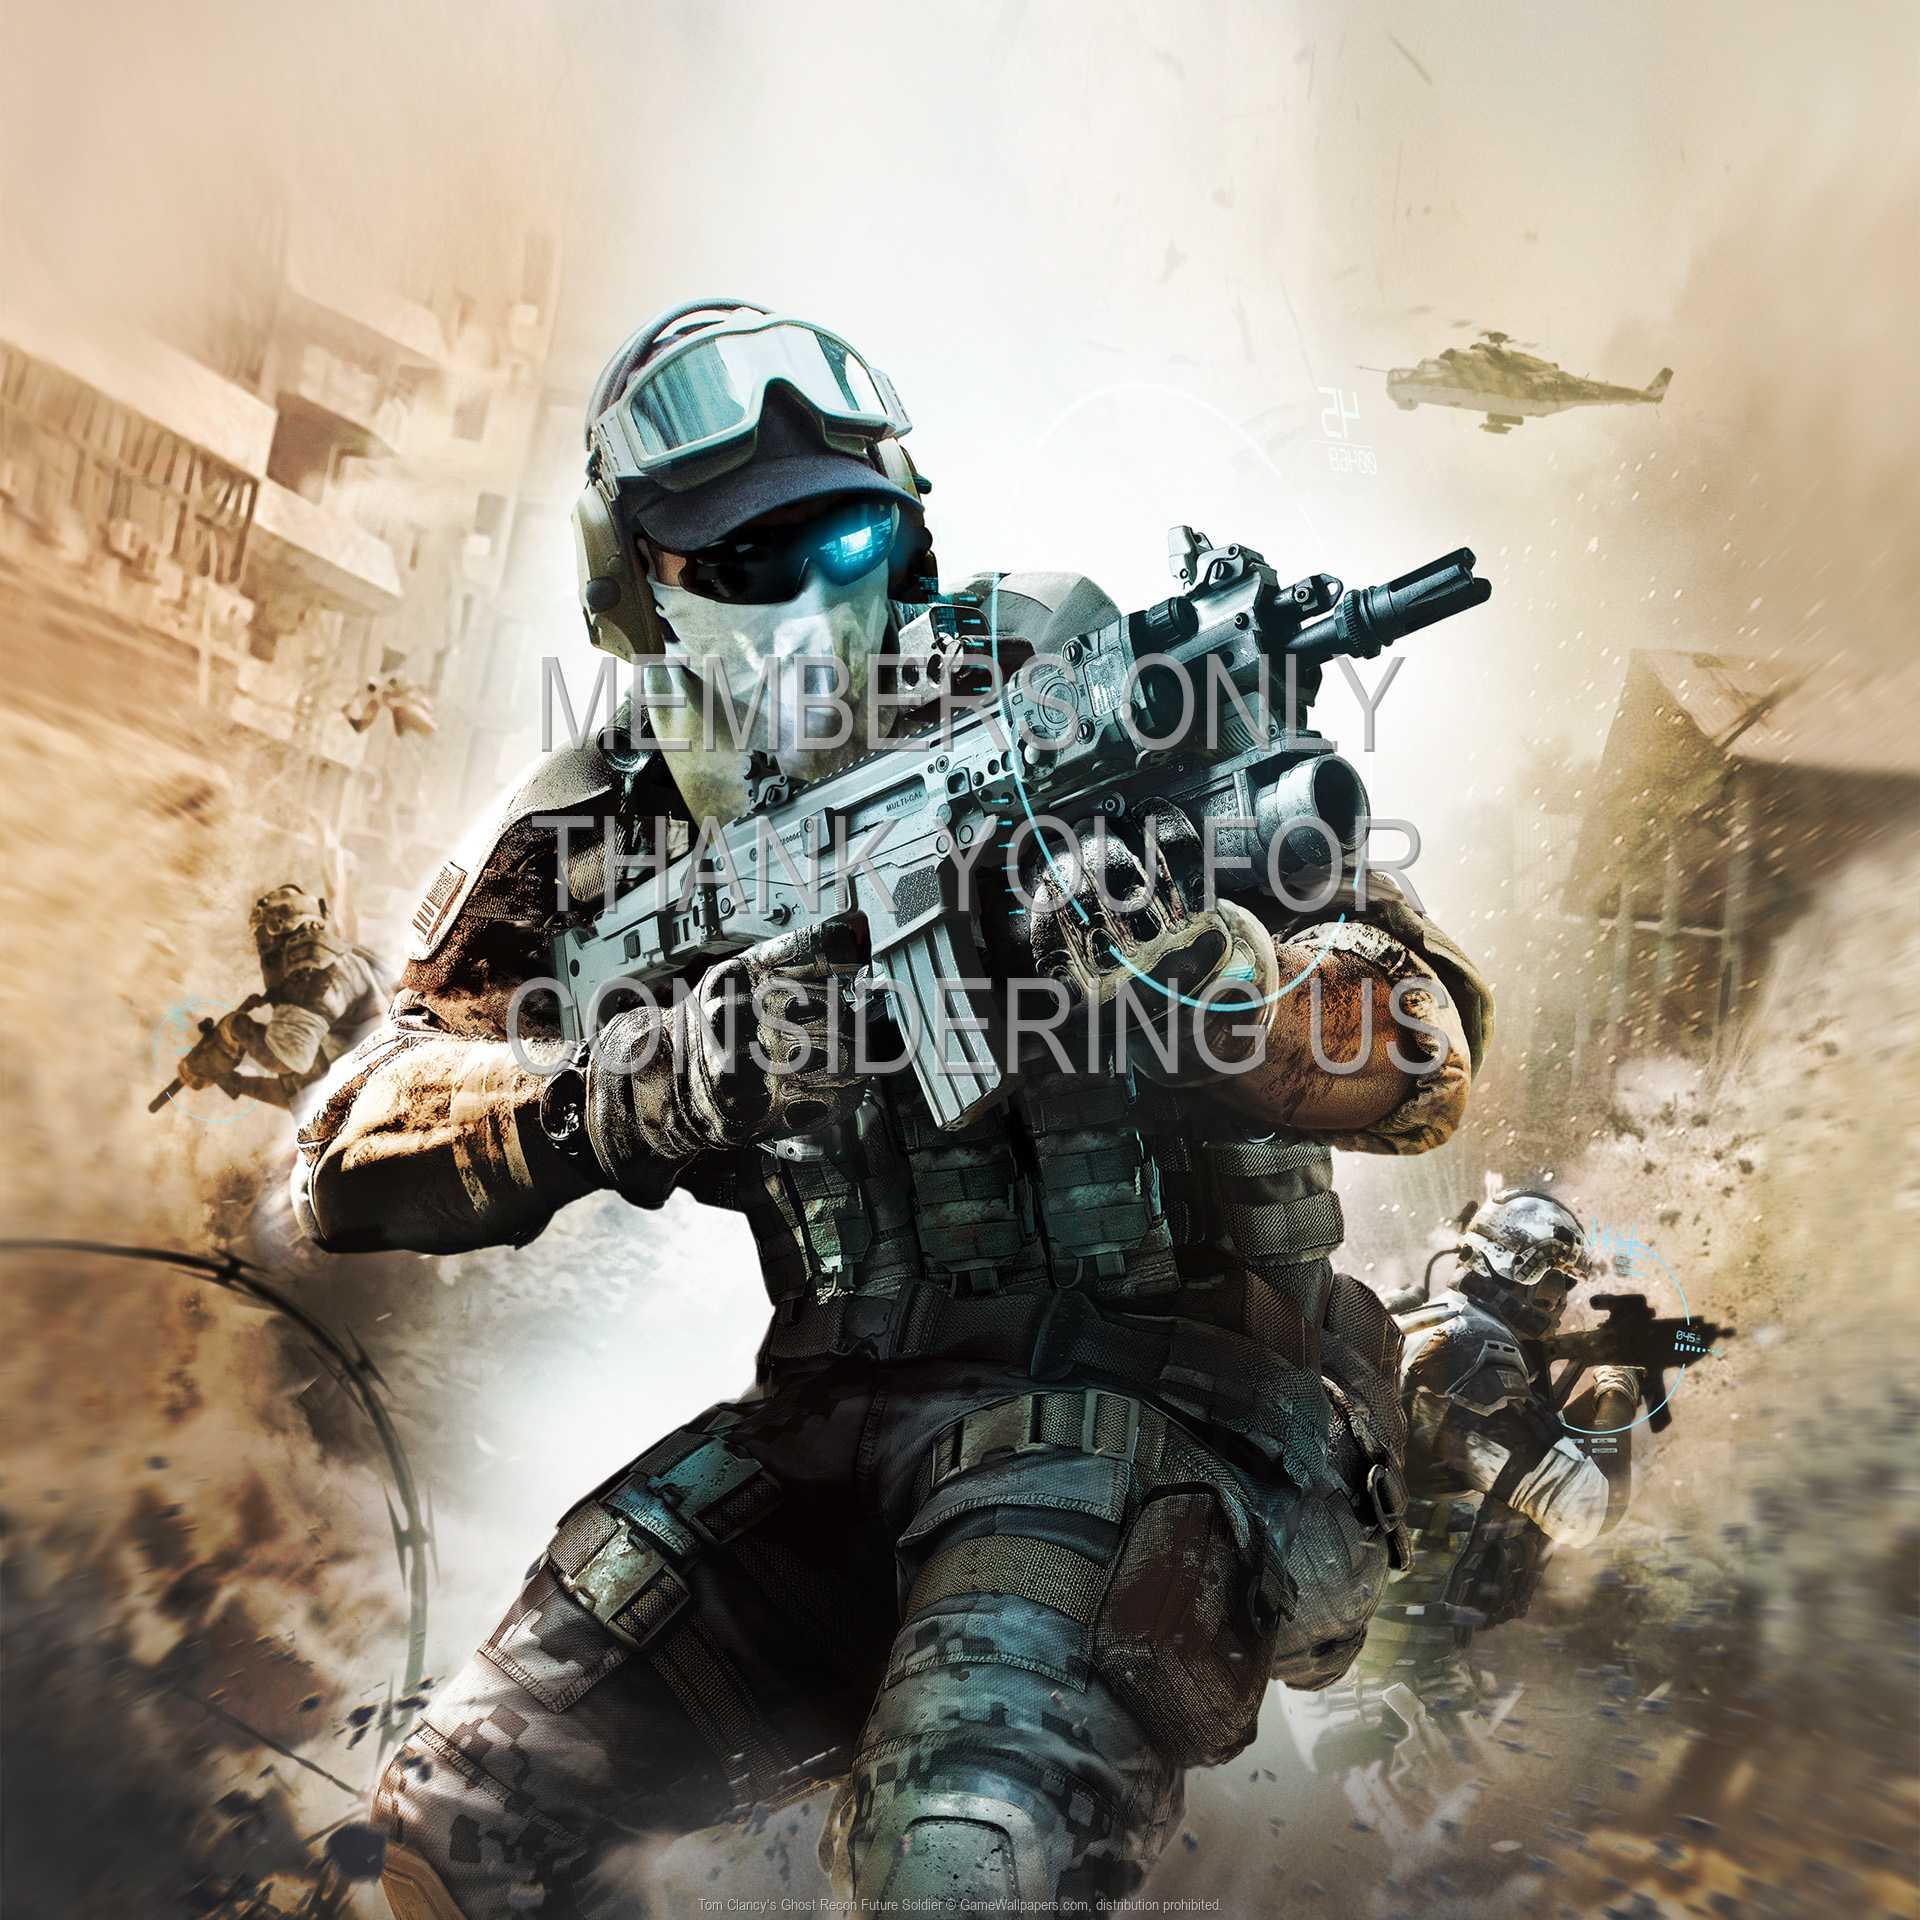 Tom Clancy's Ghost Recon: Future Soldier 1080p Horizontal Handy Hintergrundbild 06